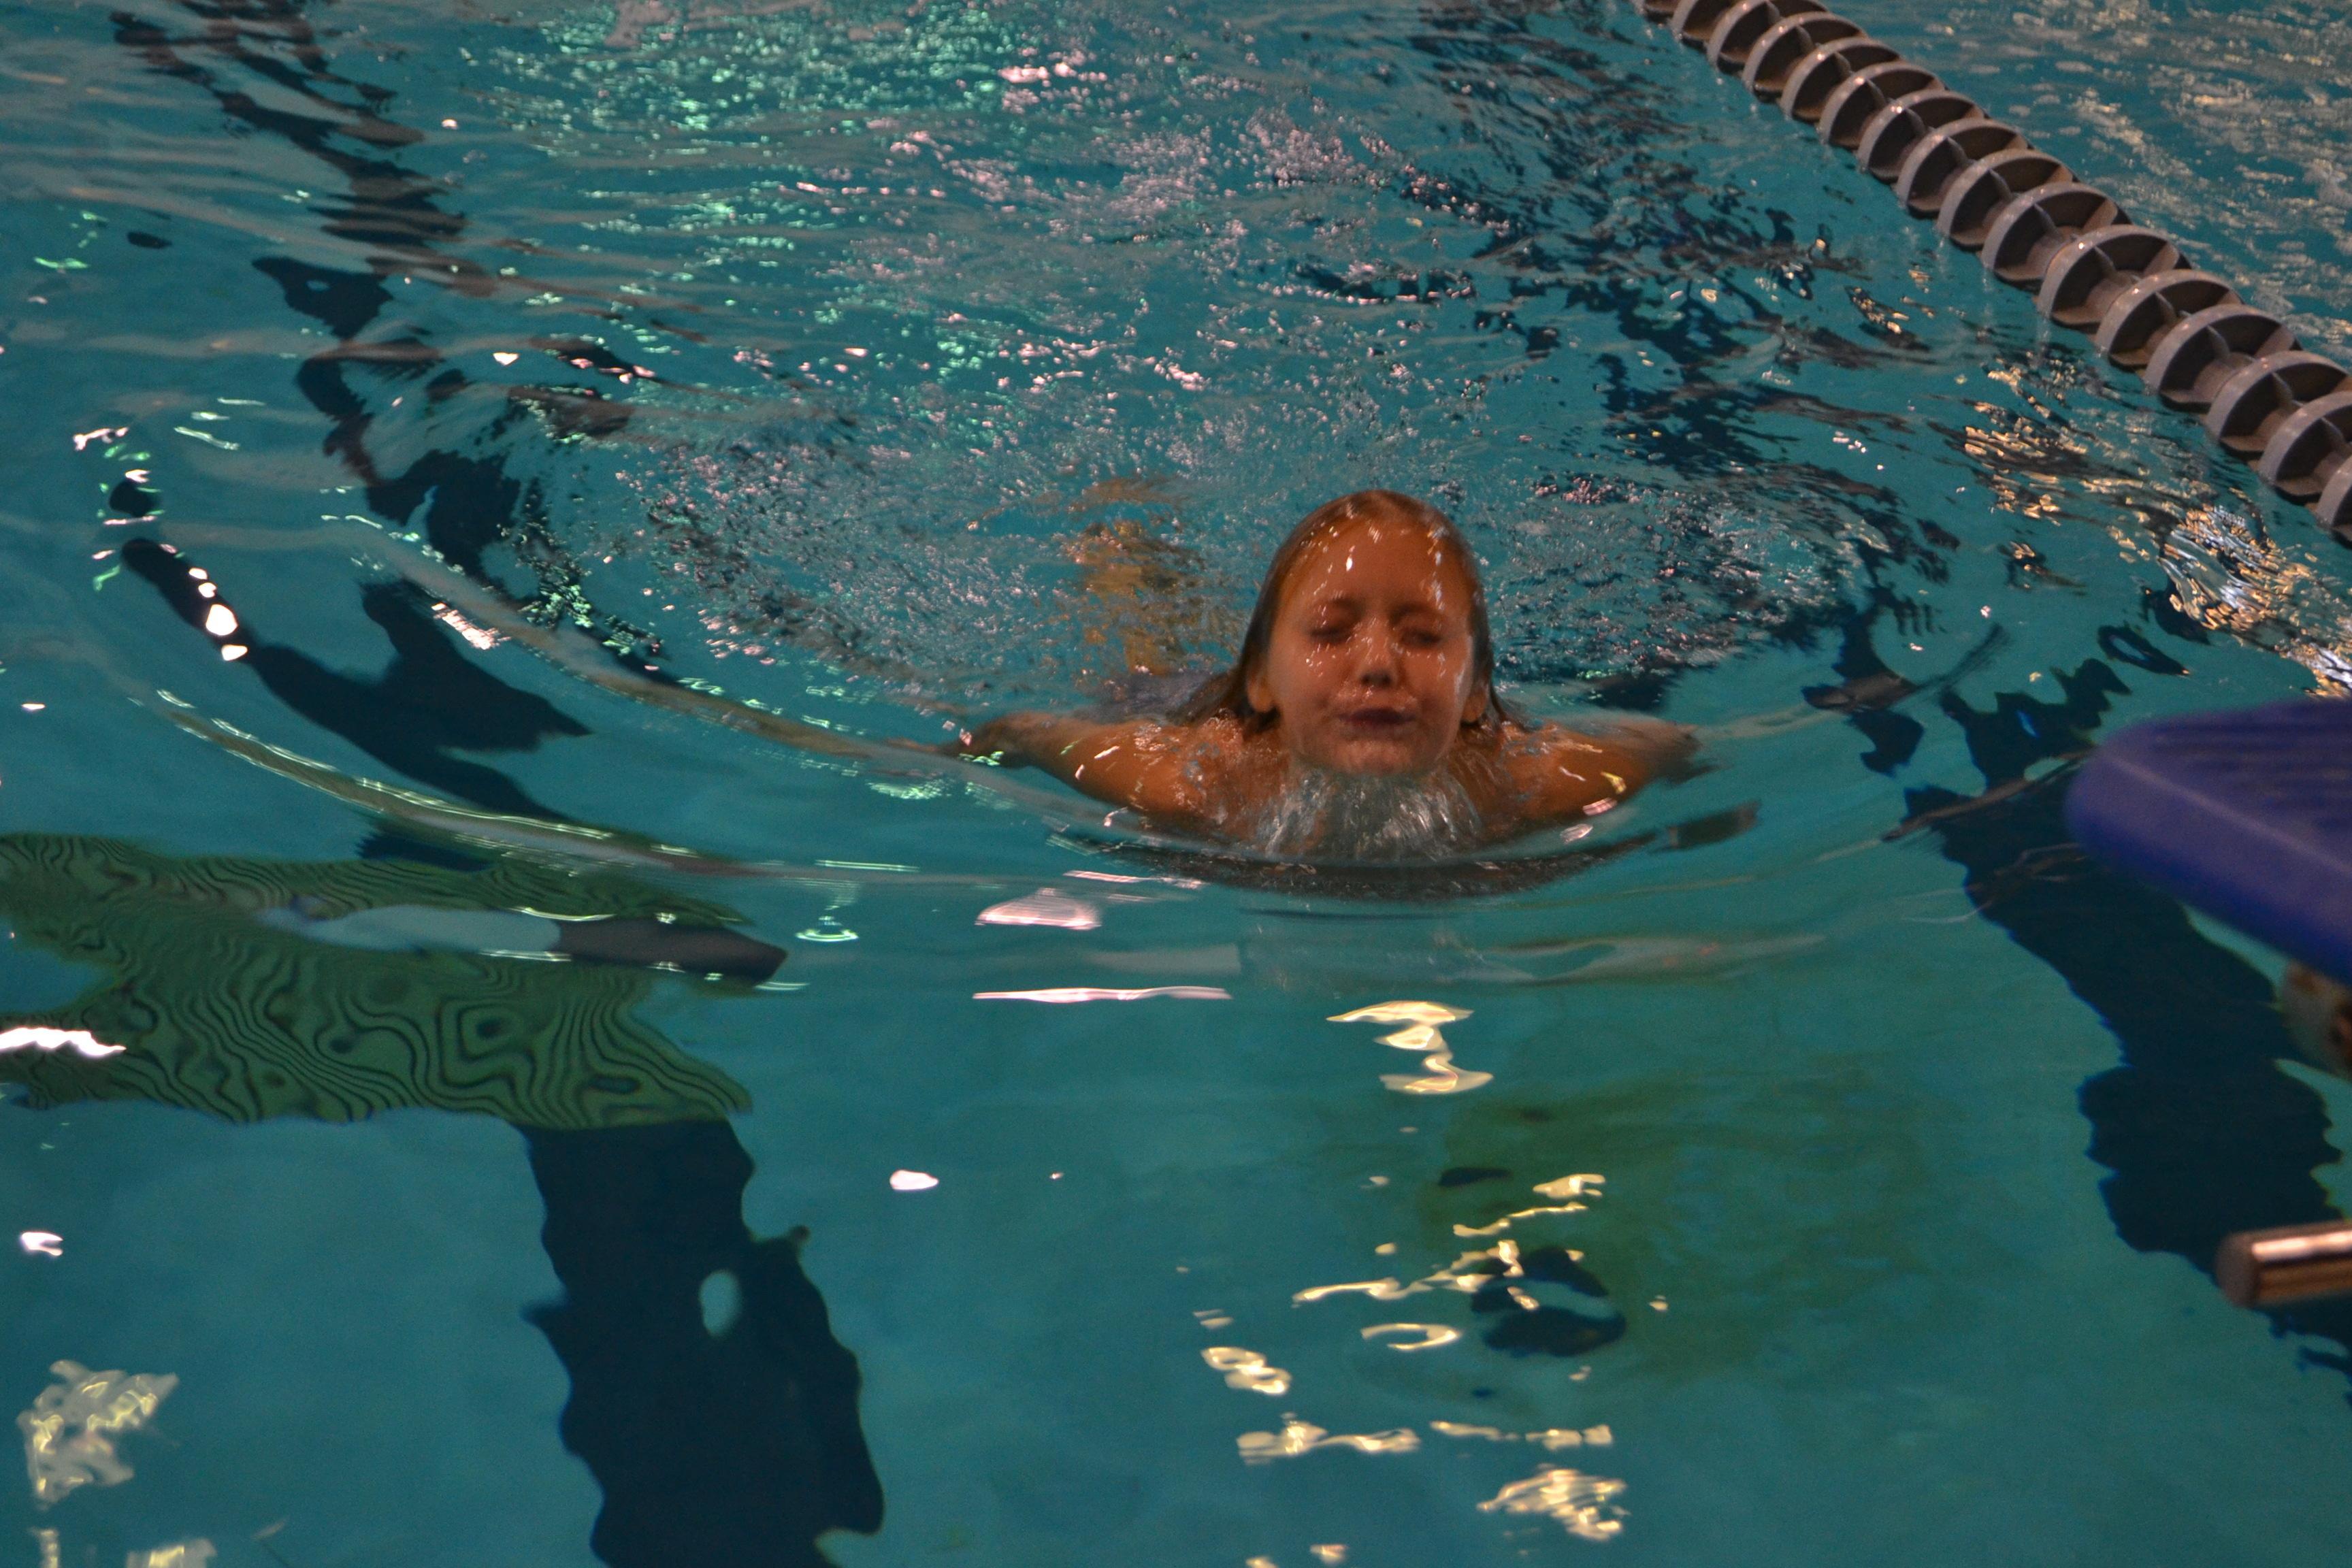 SEA LIFE Aquarium Kansas City's Young Environmentalist, Kierra Dinwiddie, swims to raise money against shark finning. (Photo: Business Wire)